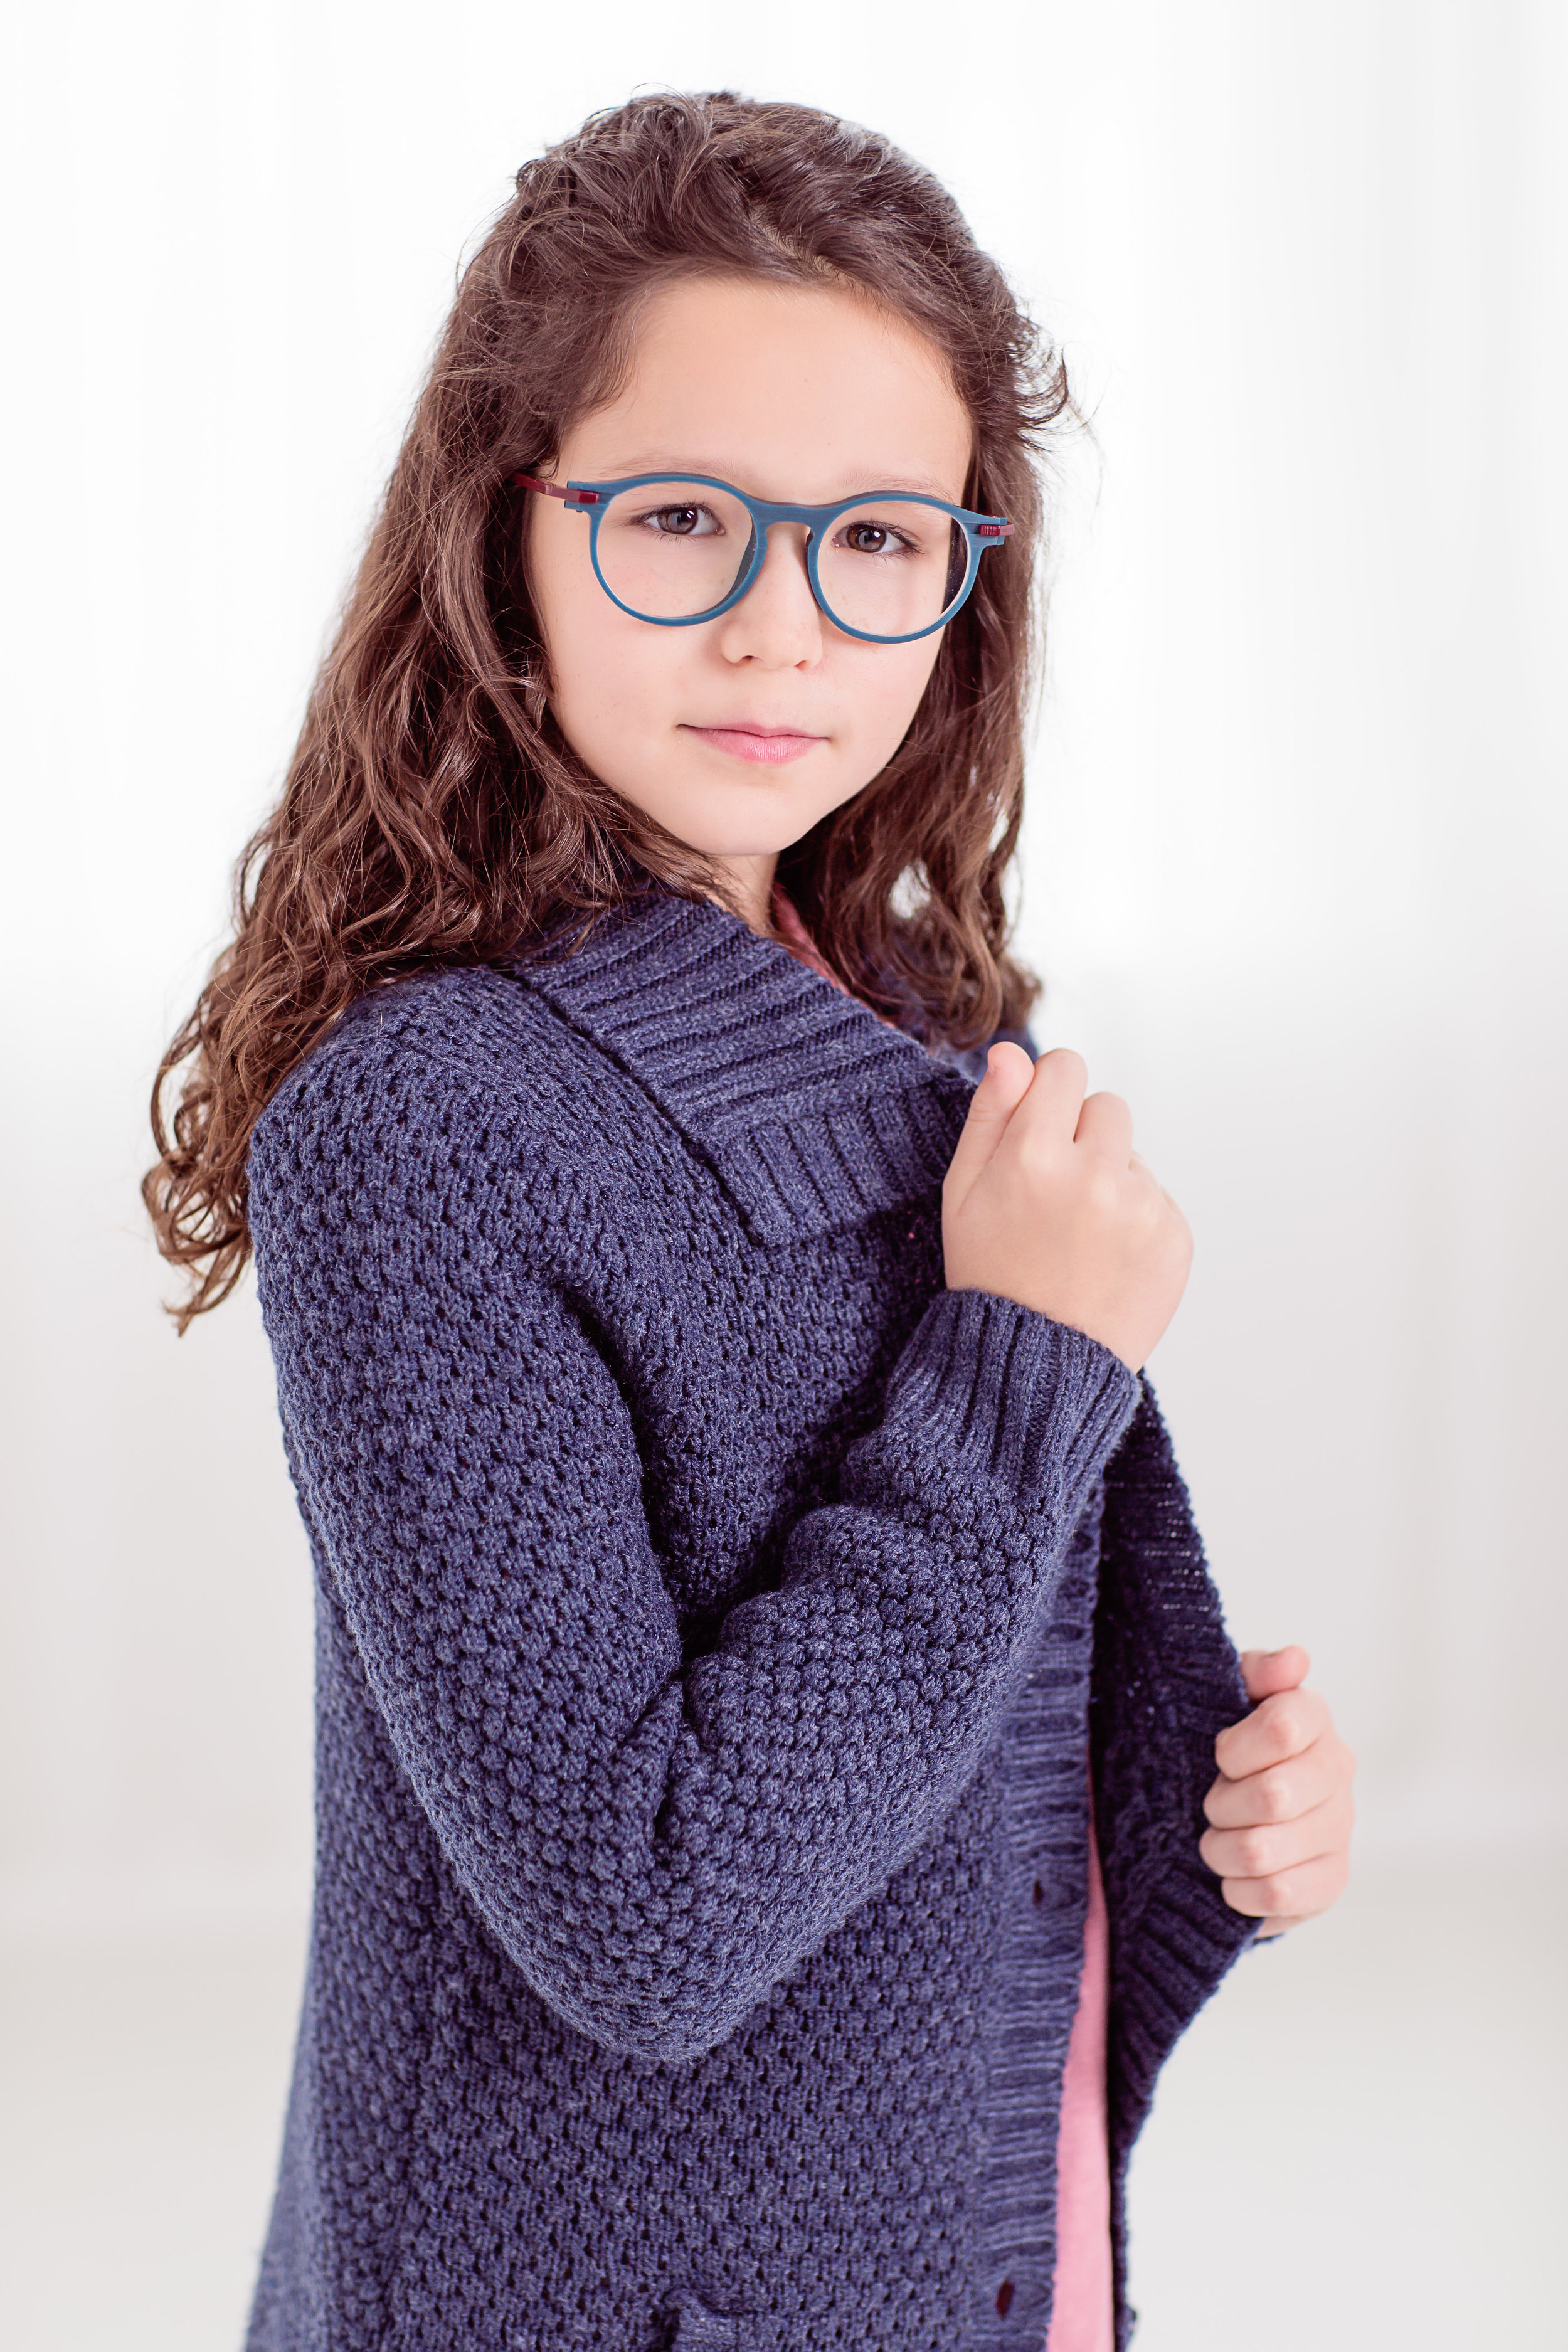 BiancaMorelloPortraits-AgencePeanut-kids-300.jpg